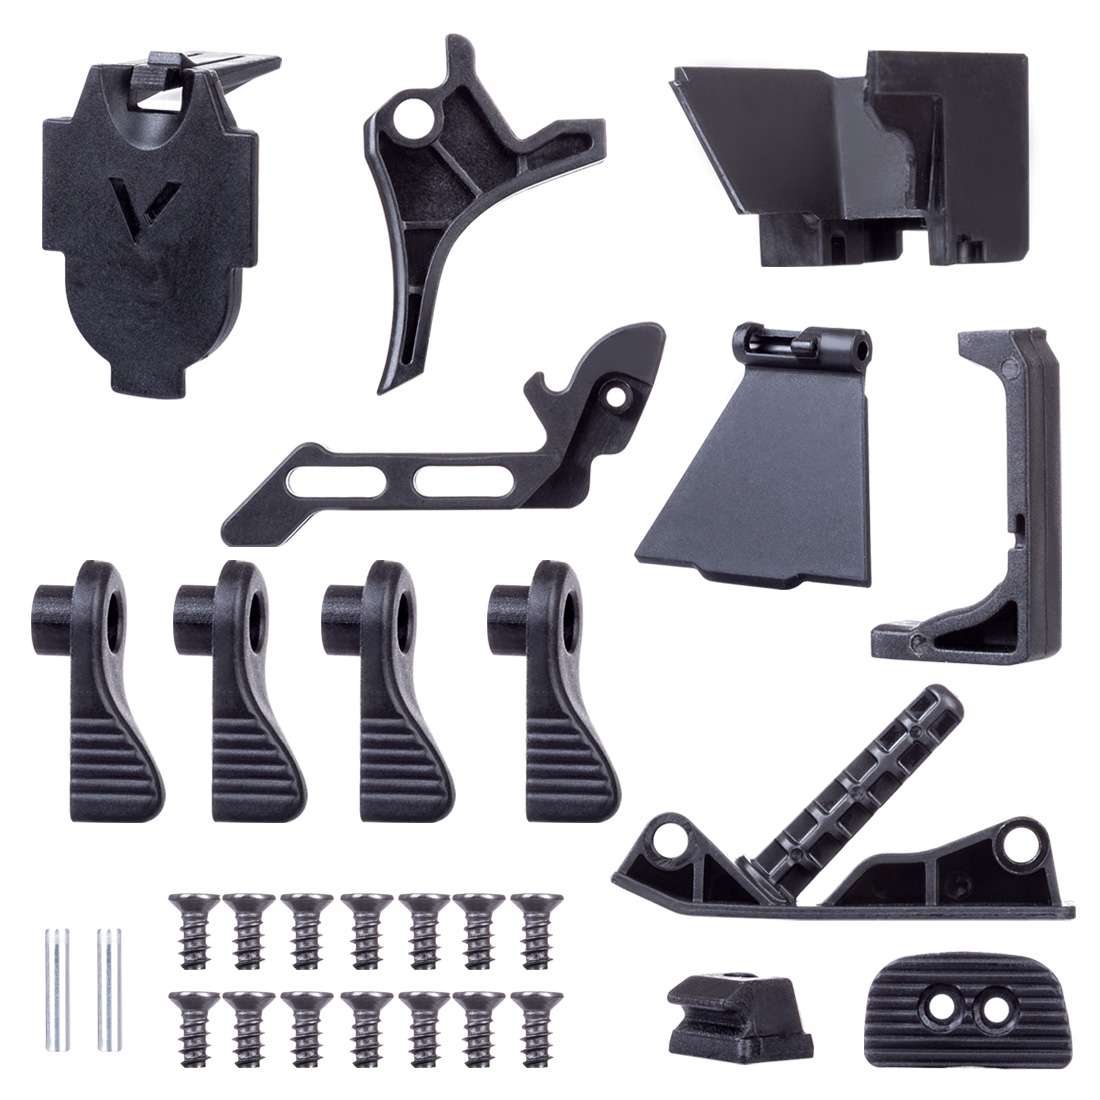 LH Vector Gen.2 Body Small Accessory Kit For LH Vector Gen.2 Water Gel Beads Blaster - Black